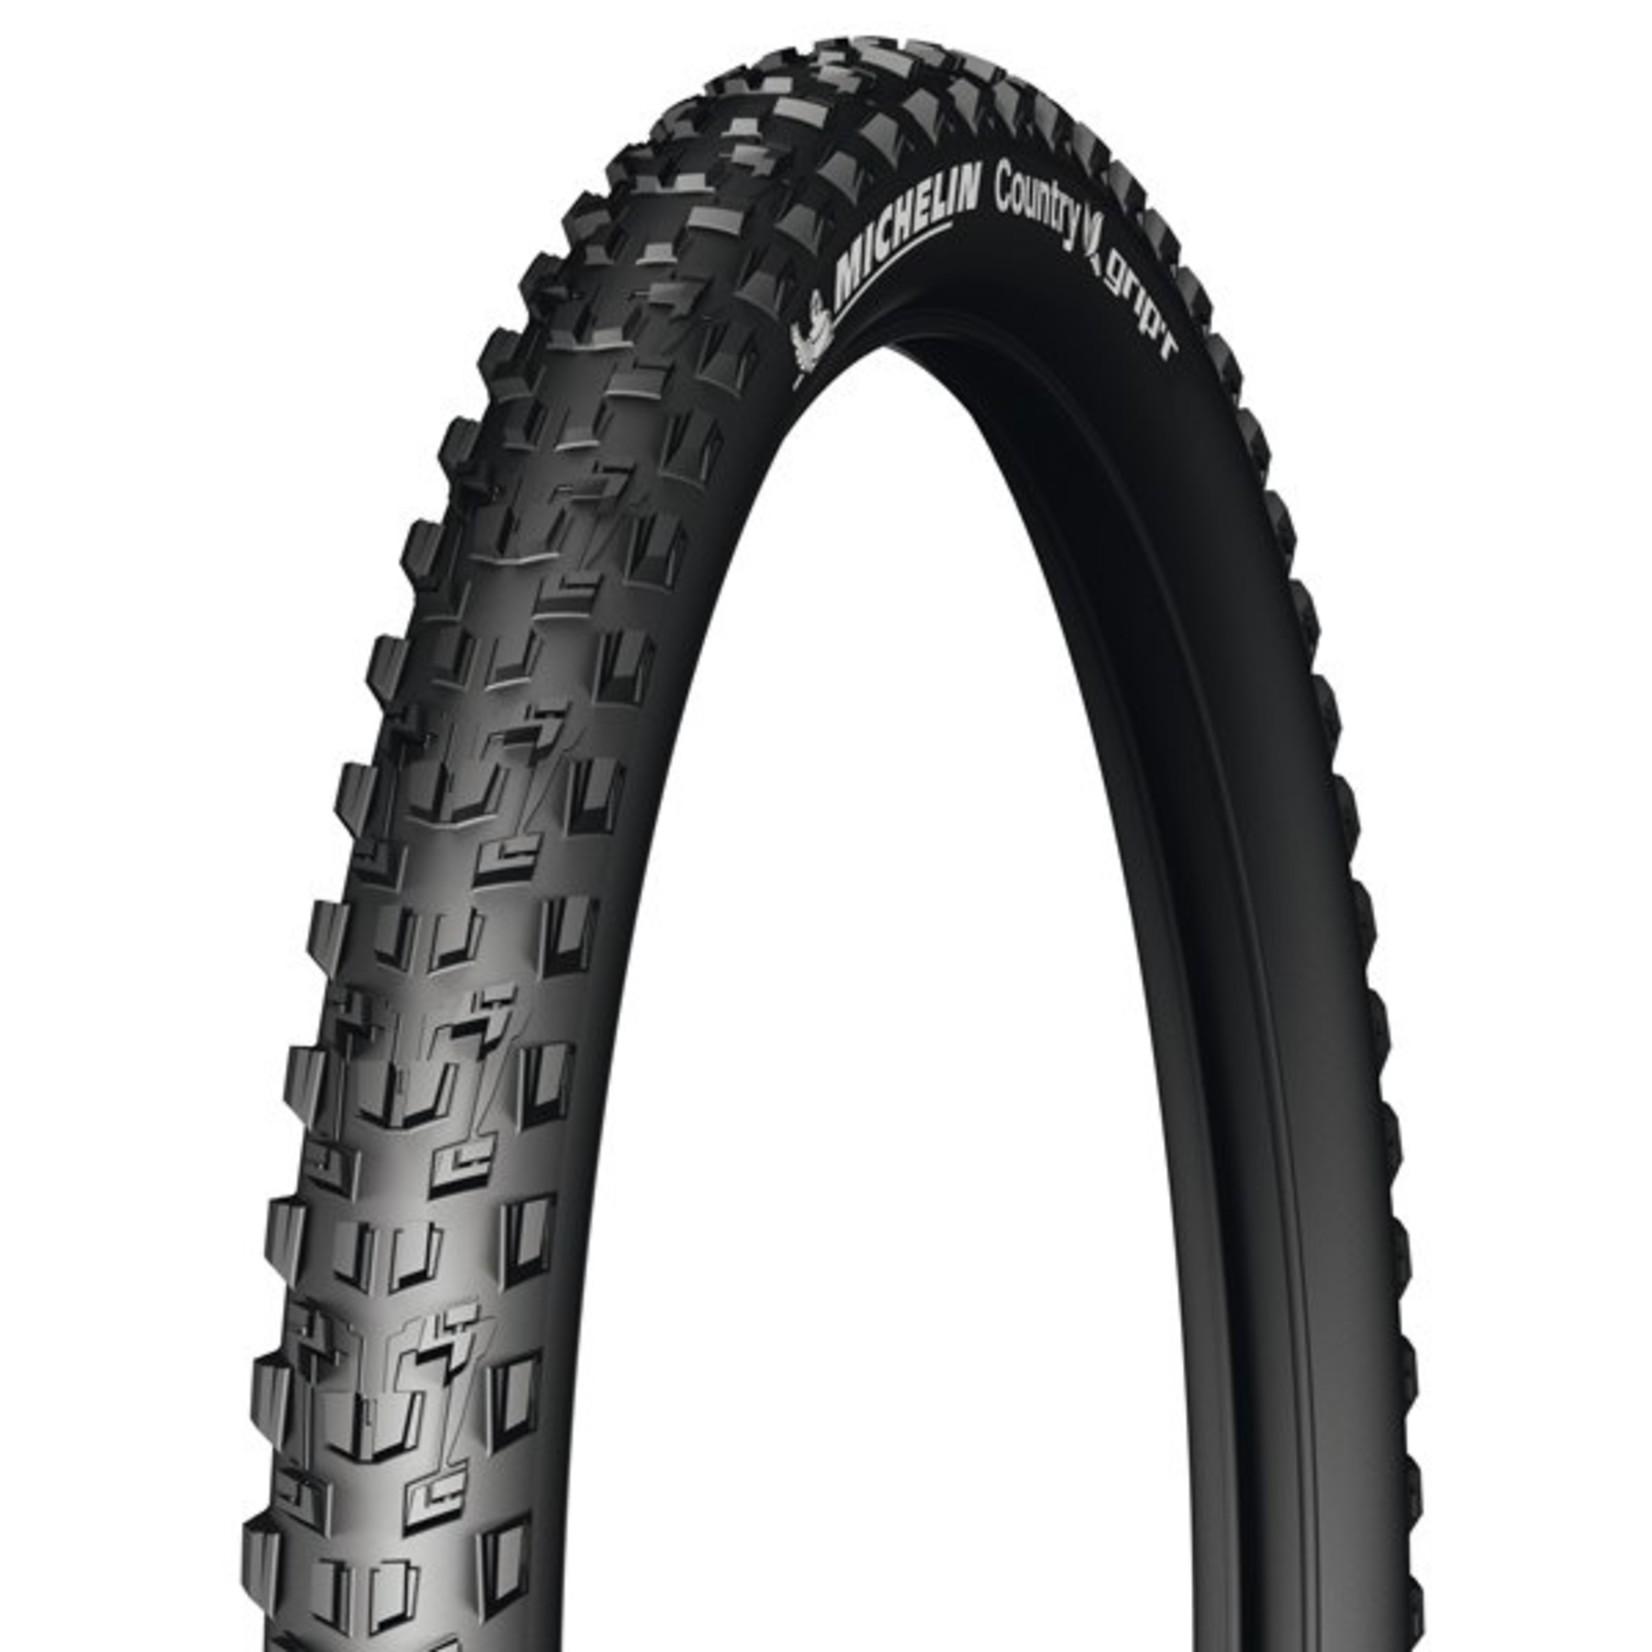 Michelin Michelin Country Grip'r Wire Bead Tire, 29x2.10